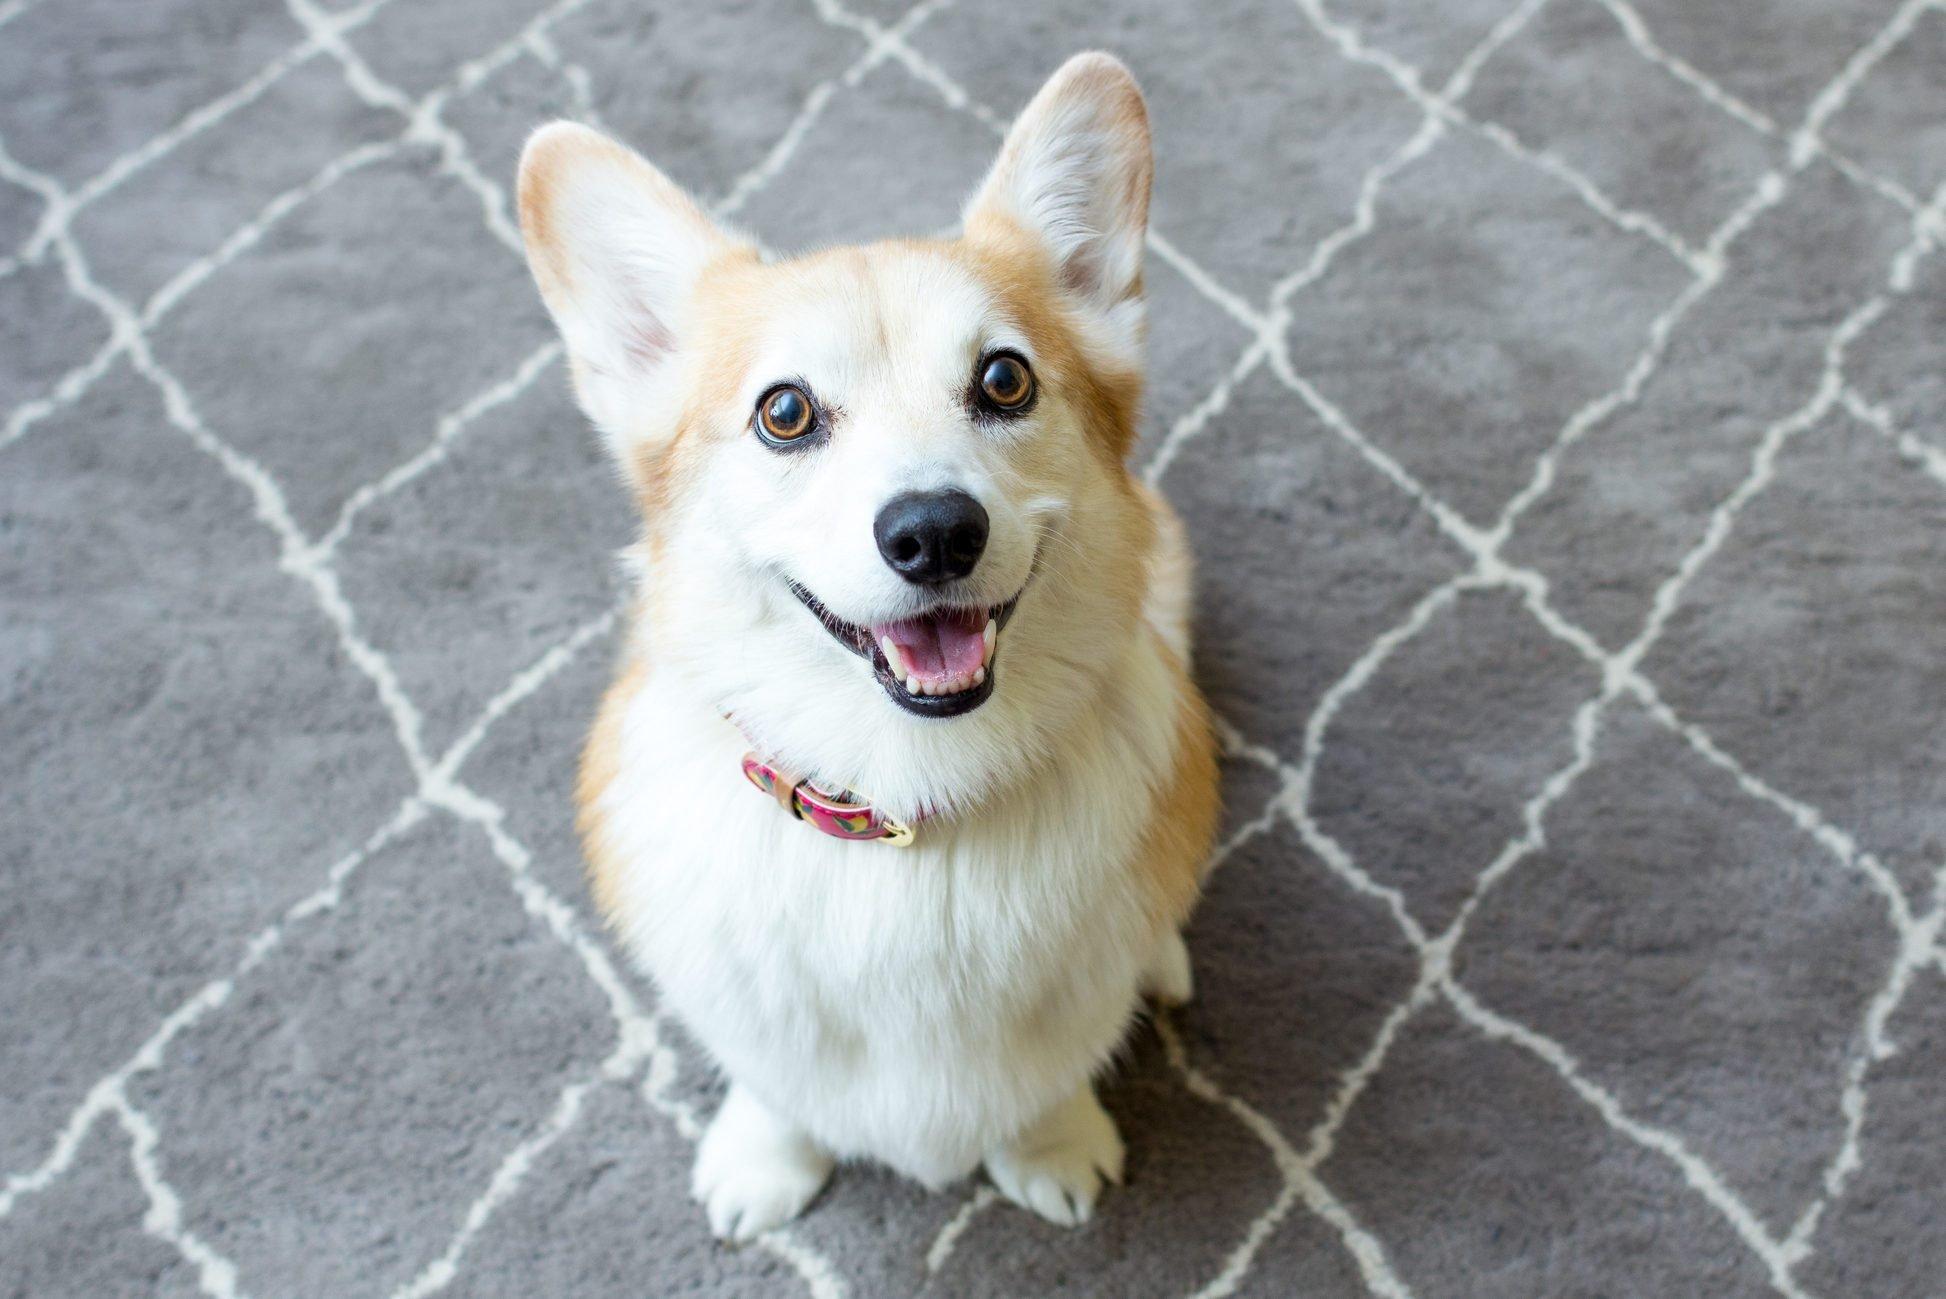 Smiling corgi sitting on rug